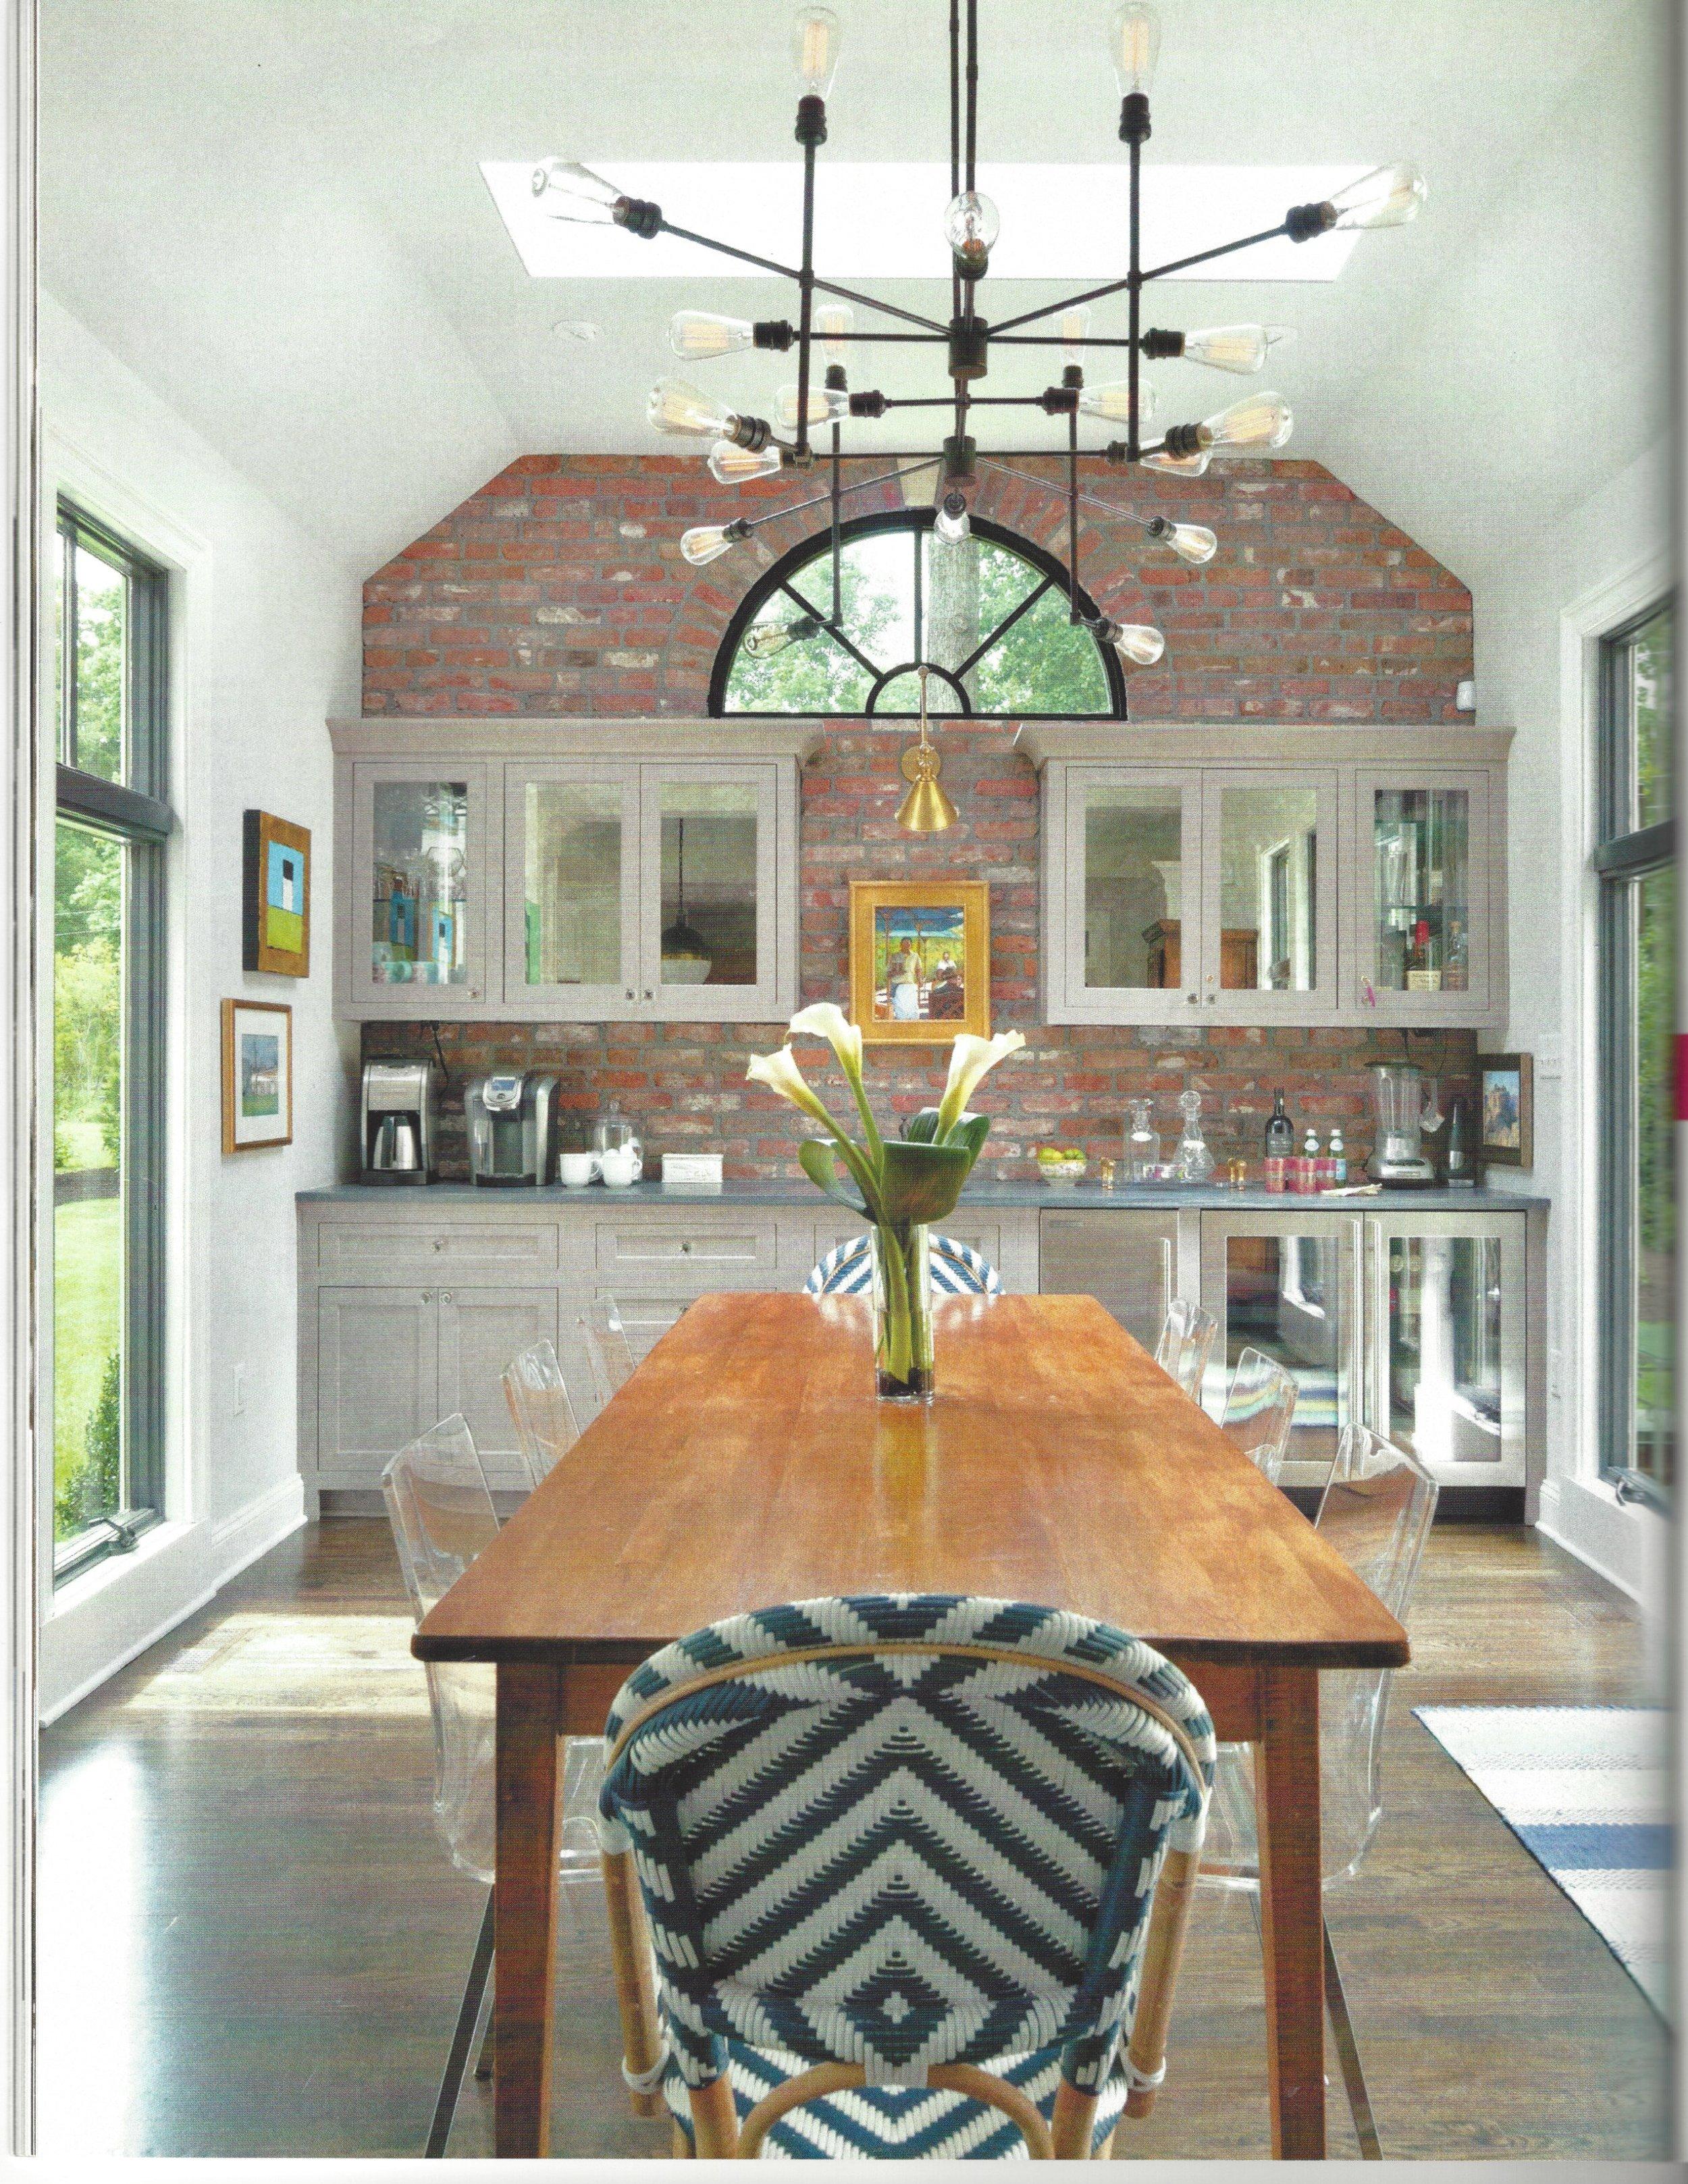 Marcia Fryer Landscape Designs | RHome Feature | Outdoor Living Room.jpeg